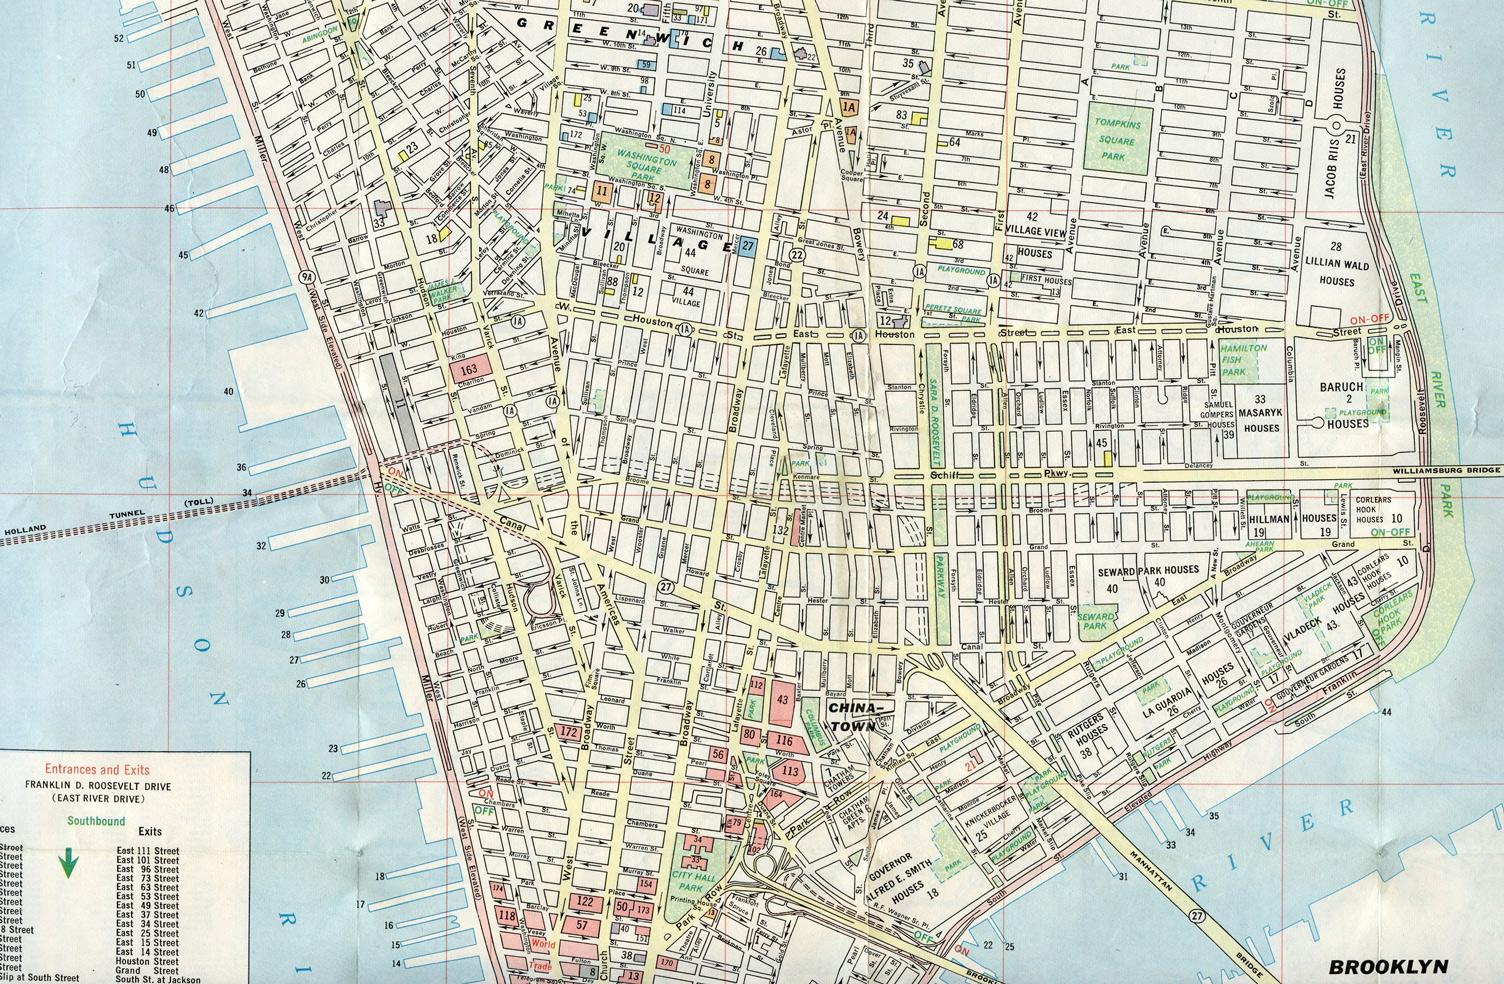 Lower Manhattan, NY - 1968